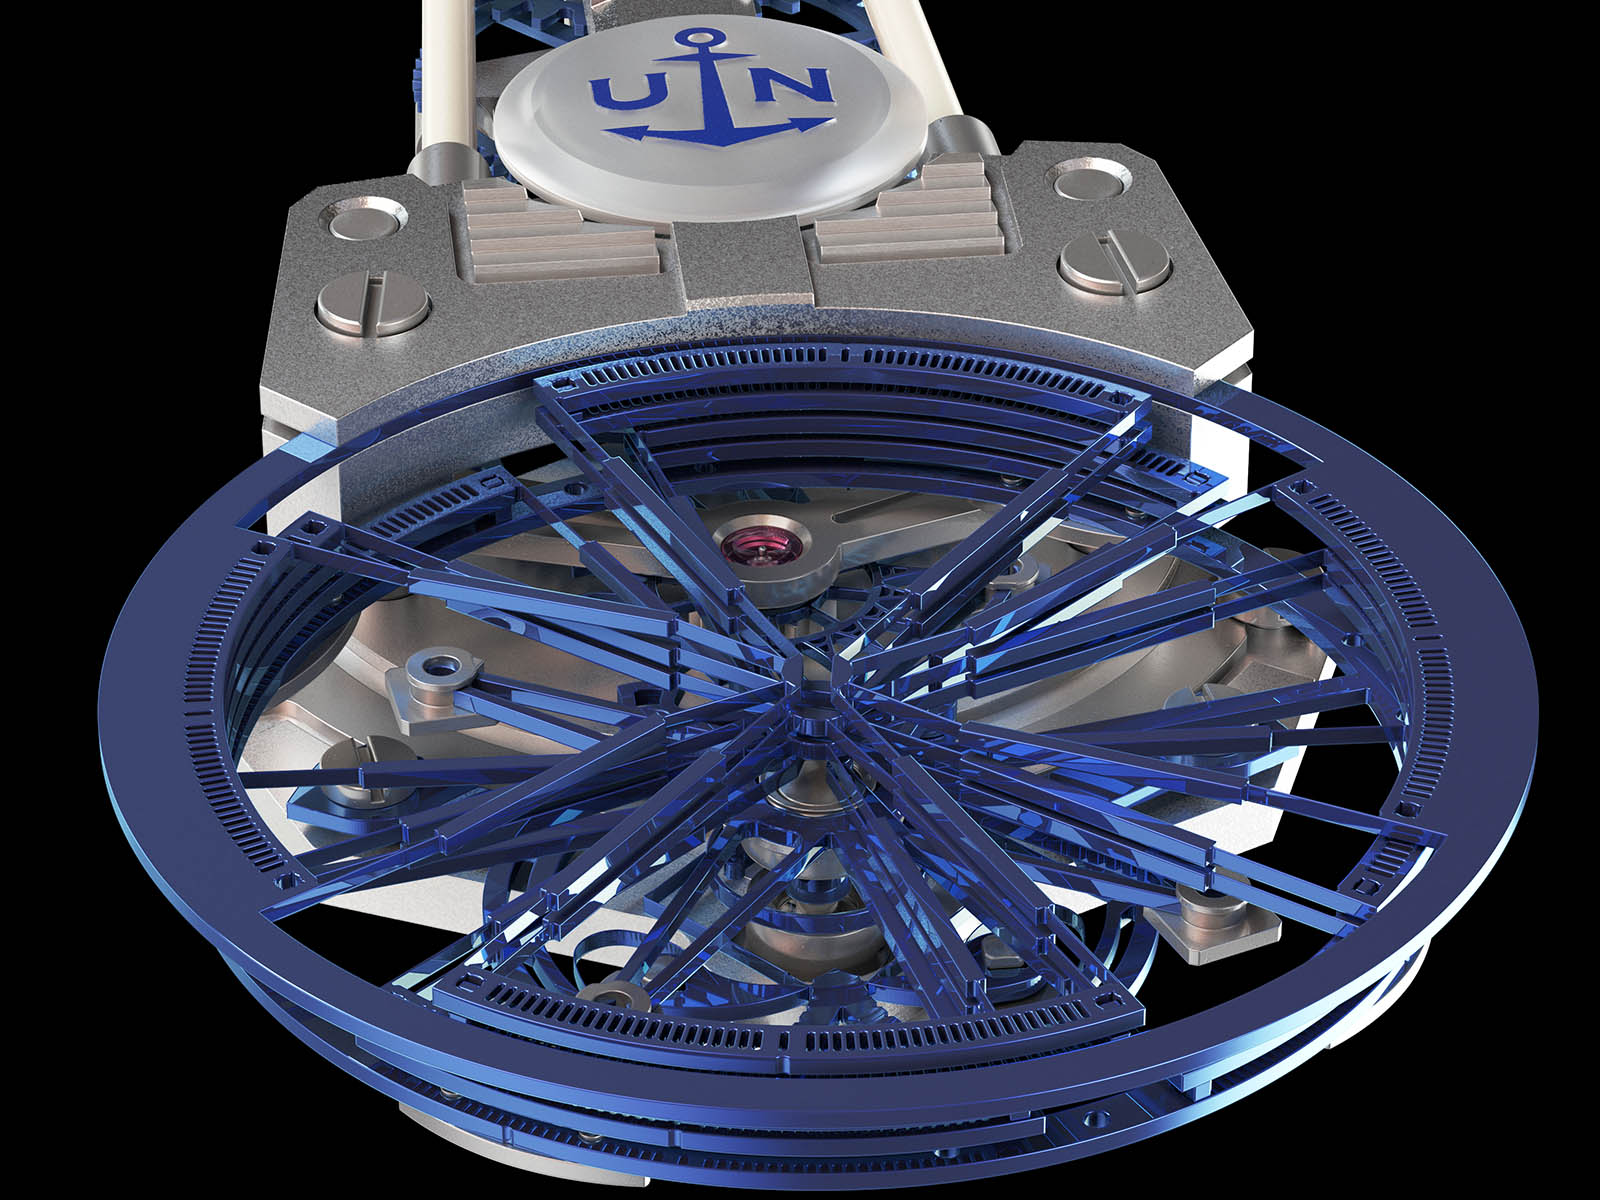 2505-250-00-ulysse-nardin-freak-next-concept-8.jpg